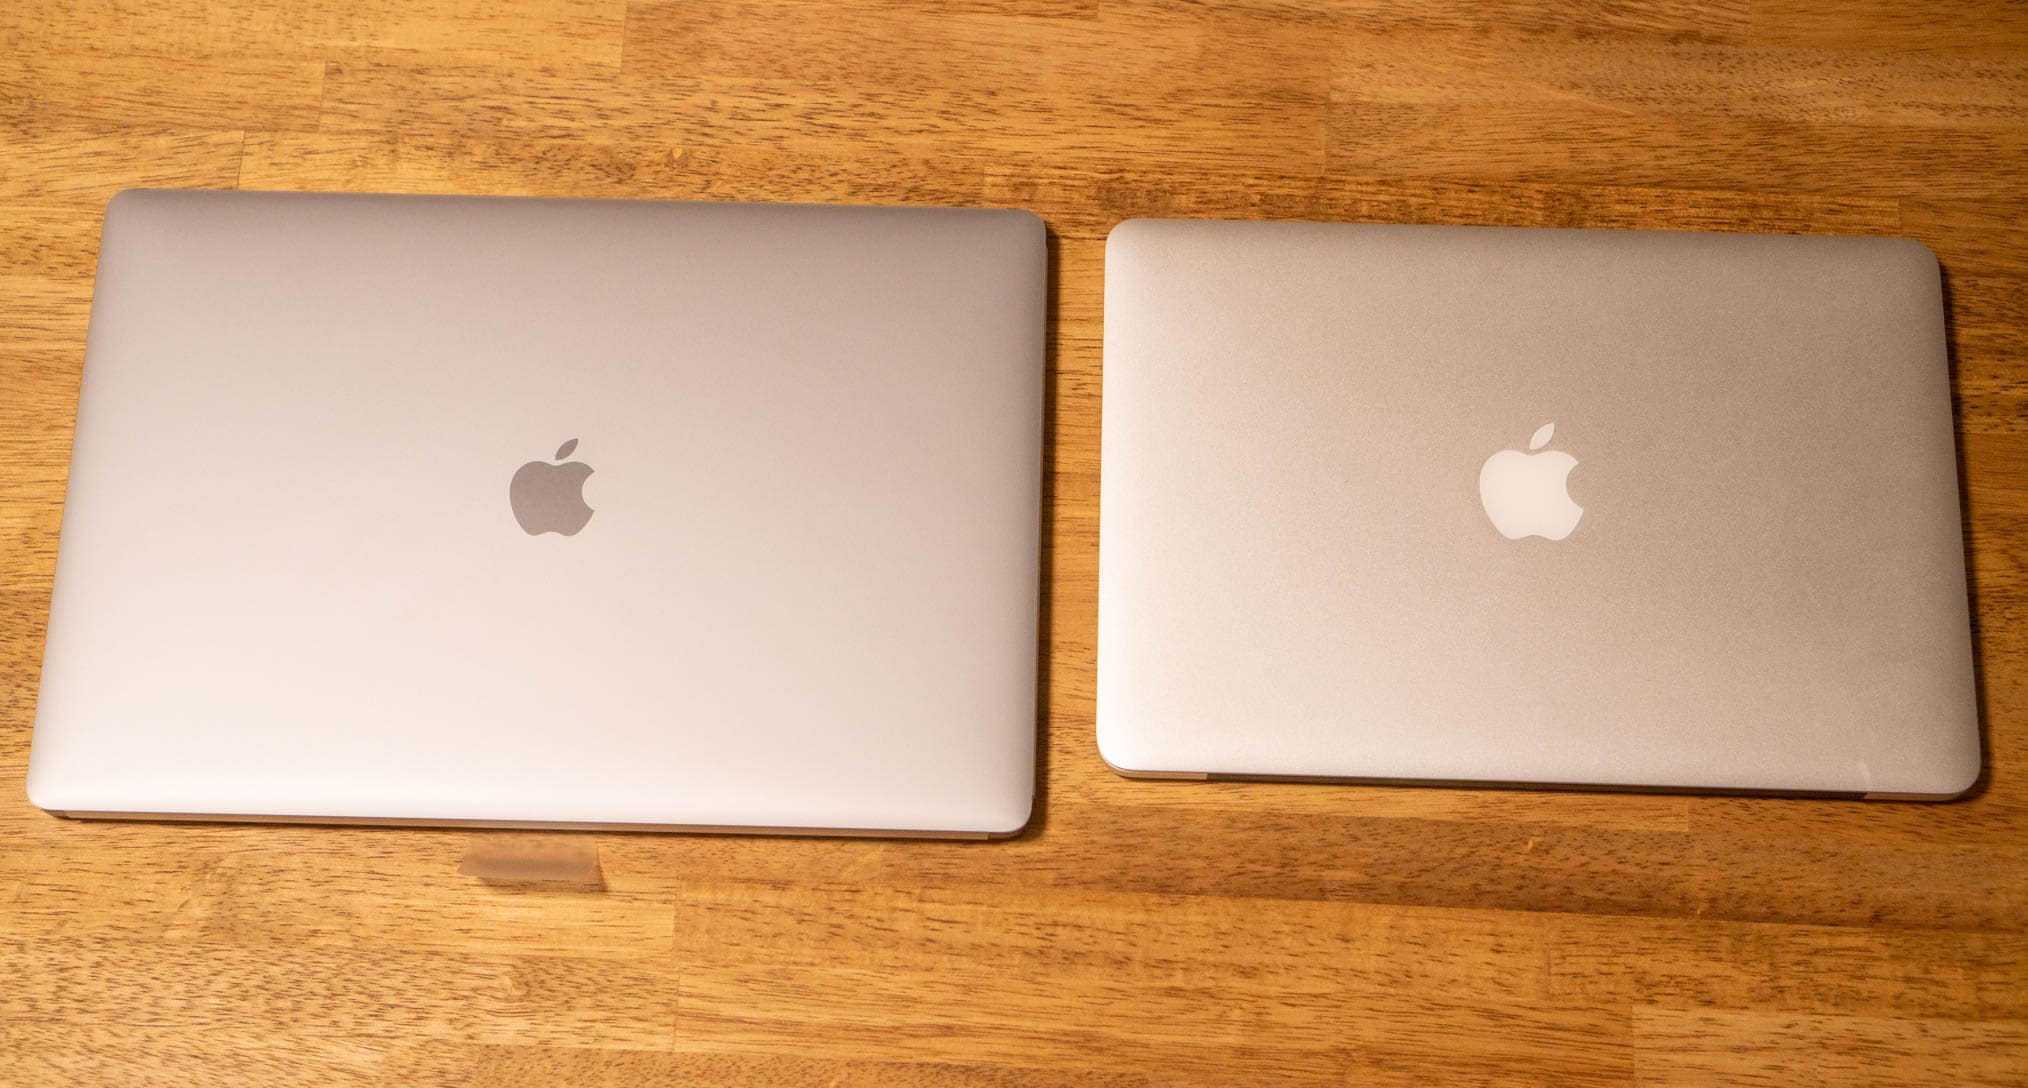 MacBookを買ったらやること【Webデザイナー編】